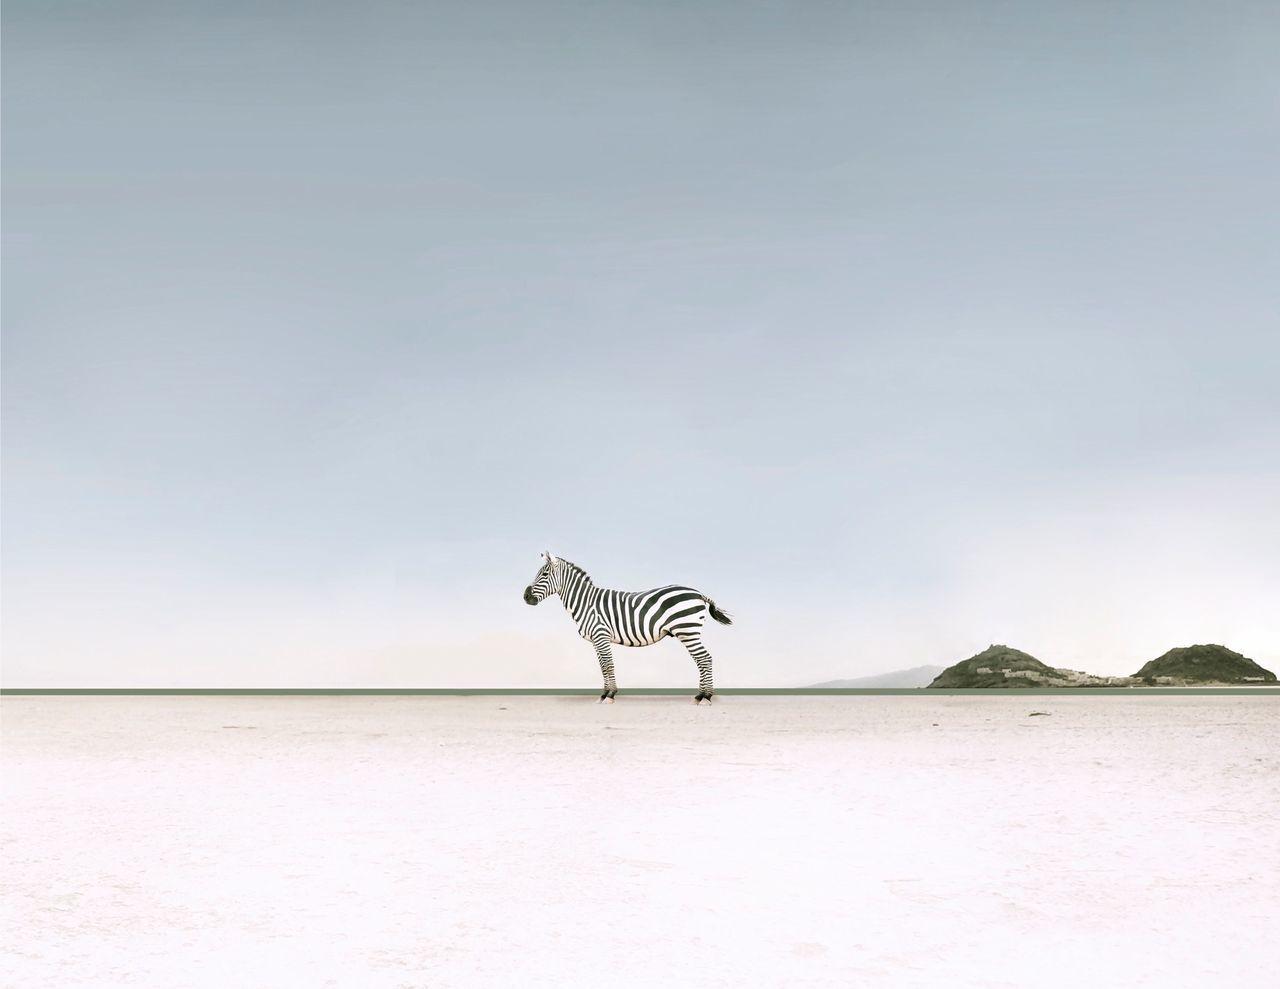 Zebra standing at beach against sky